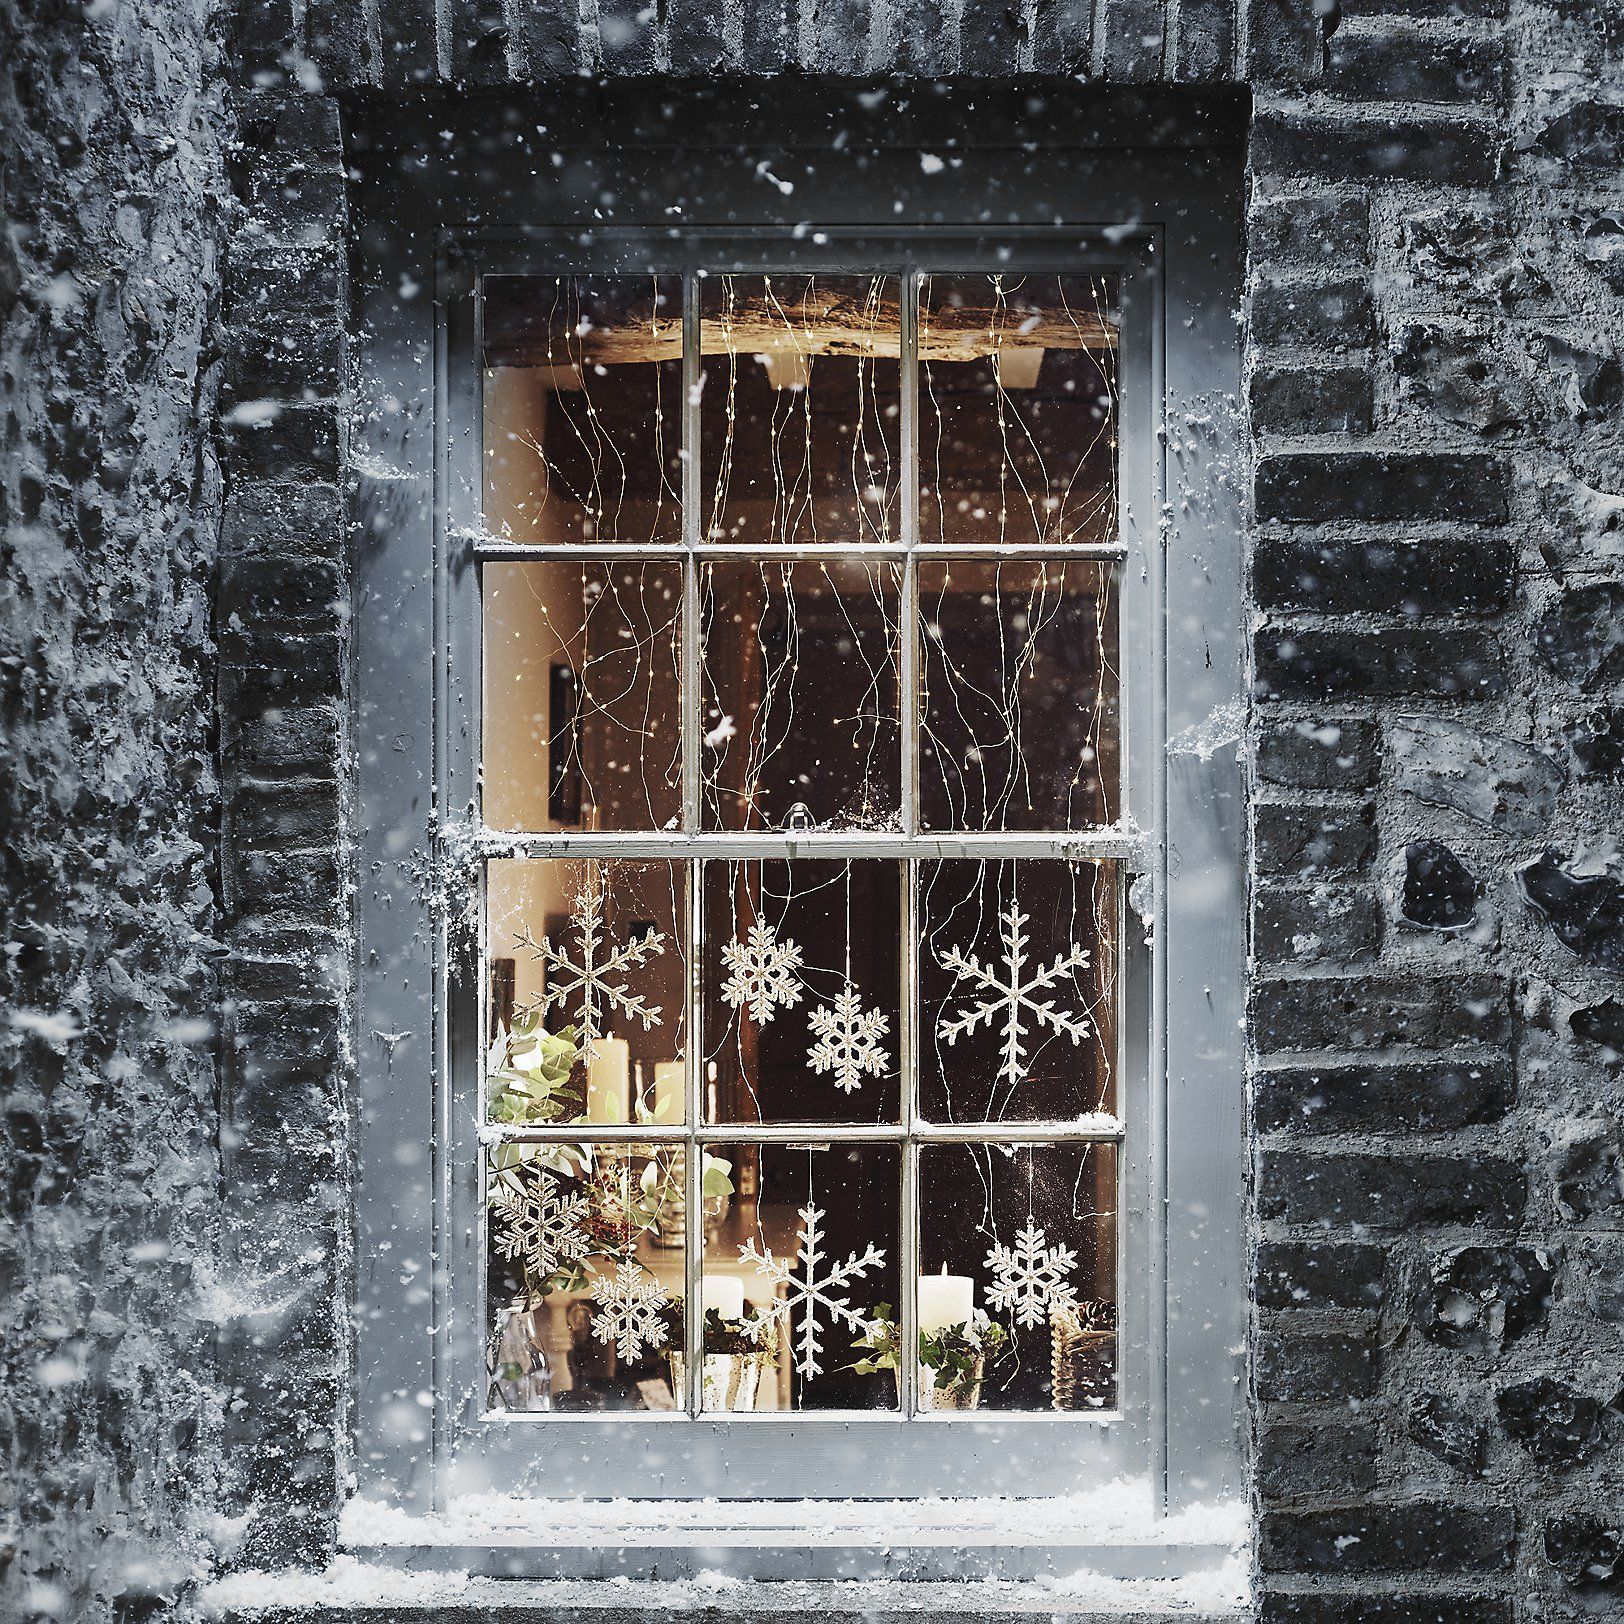 Cascading Fairy Lights 300 Bulbs The White Company Uk Christmas Window Christmas Lights Christmas Aesthetic